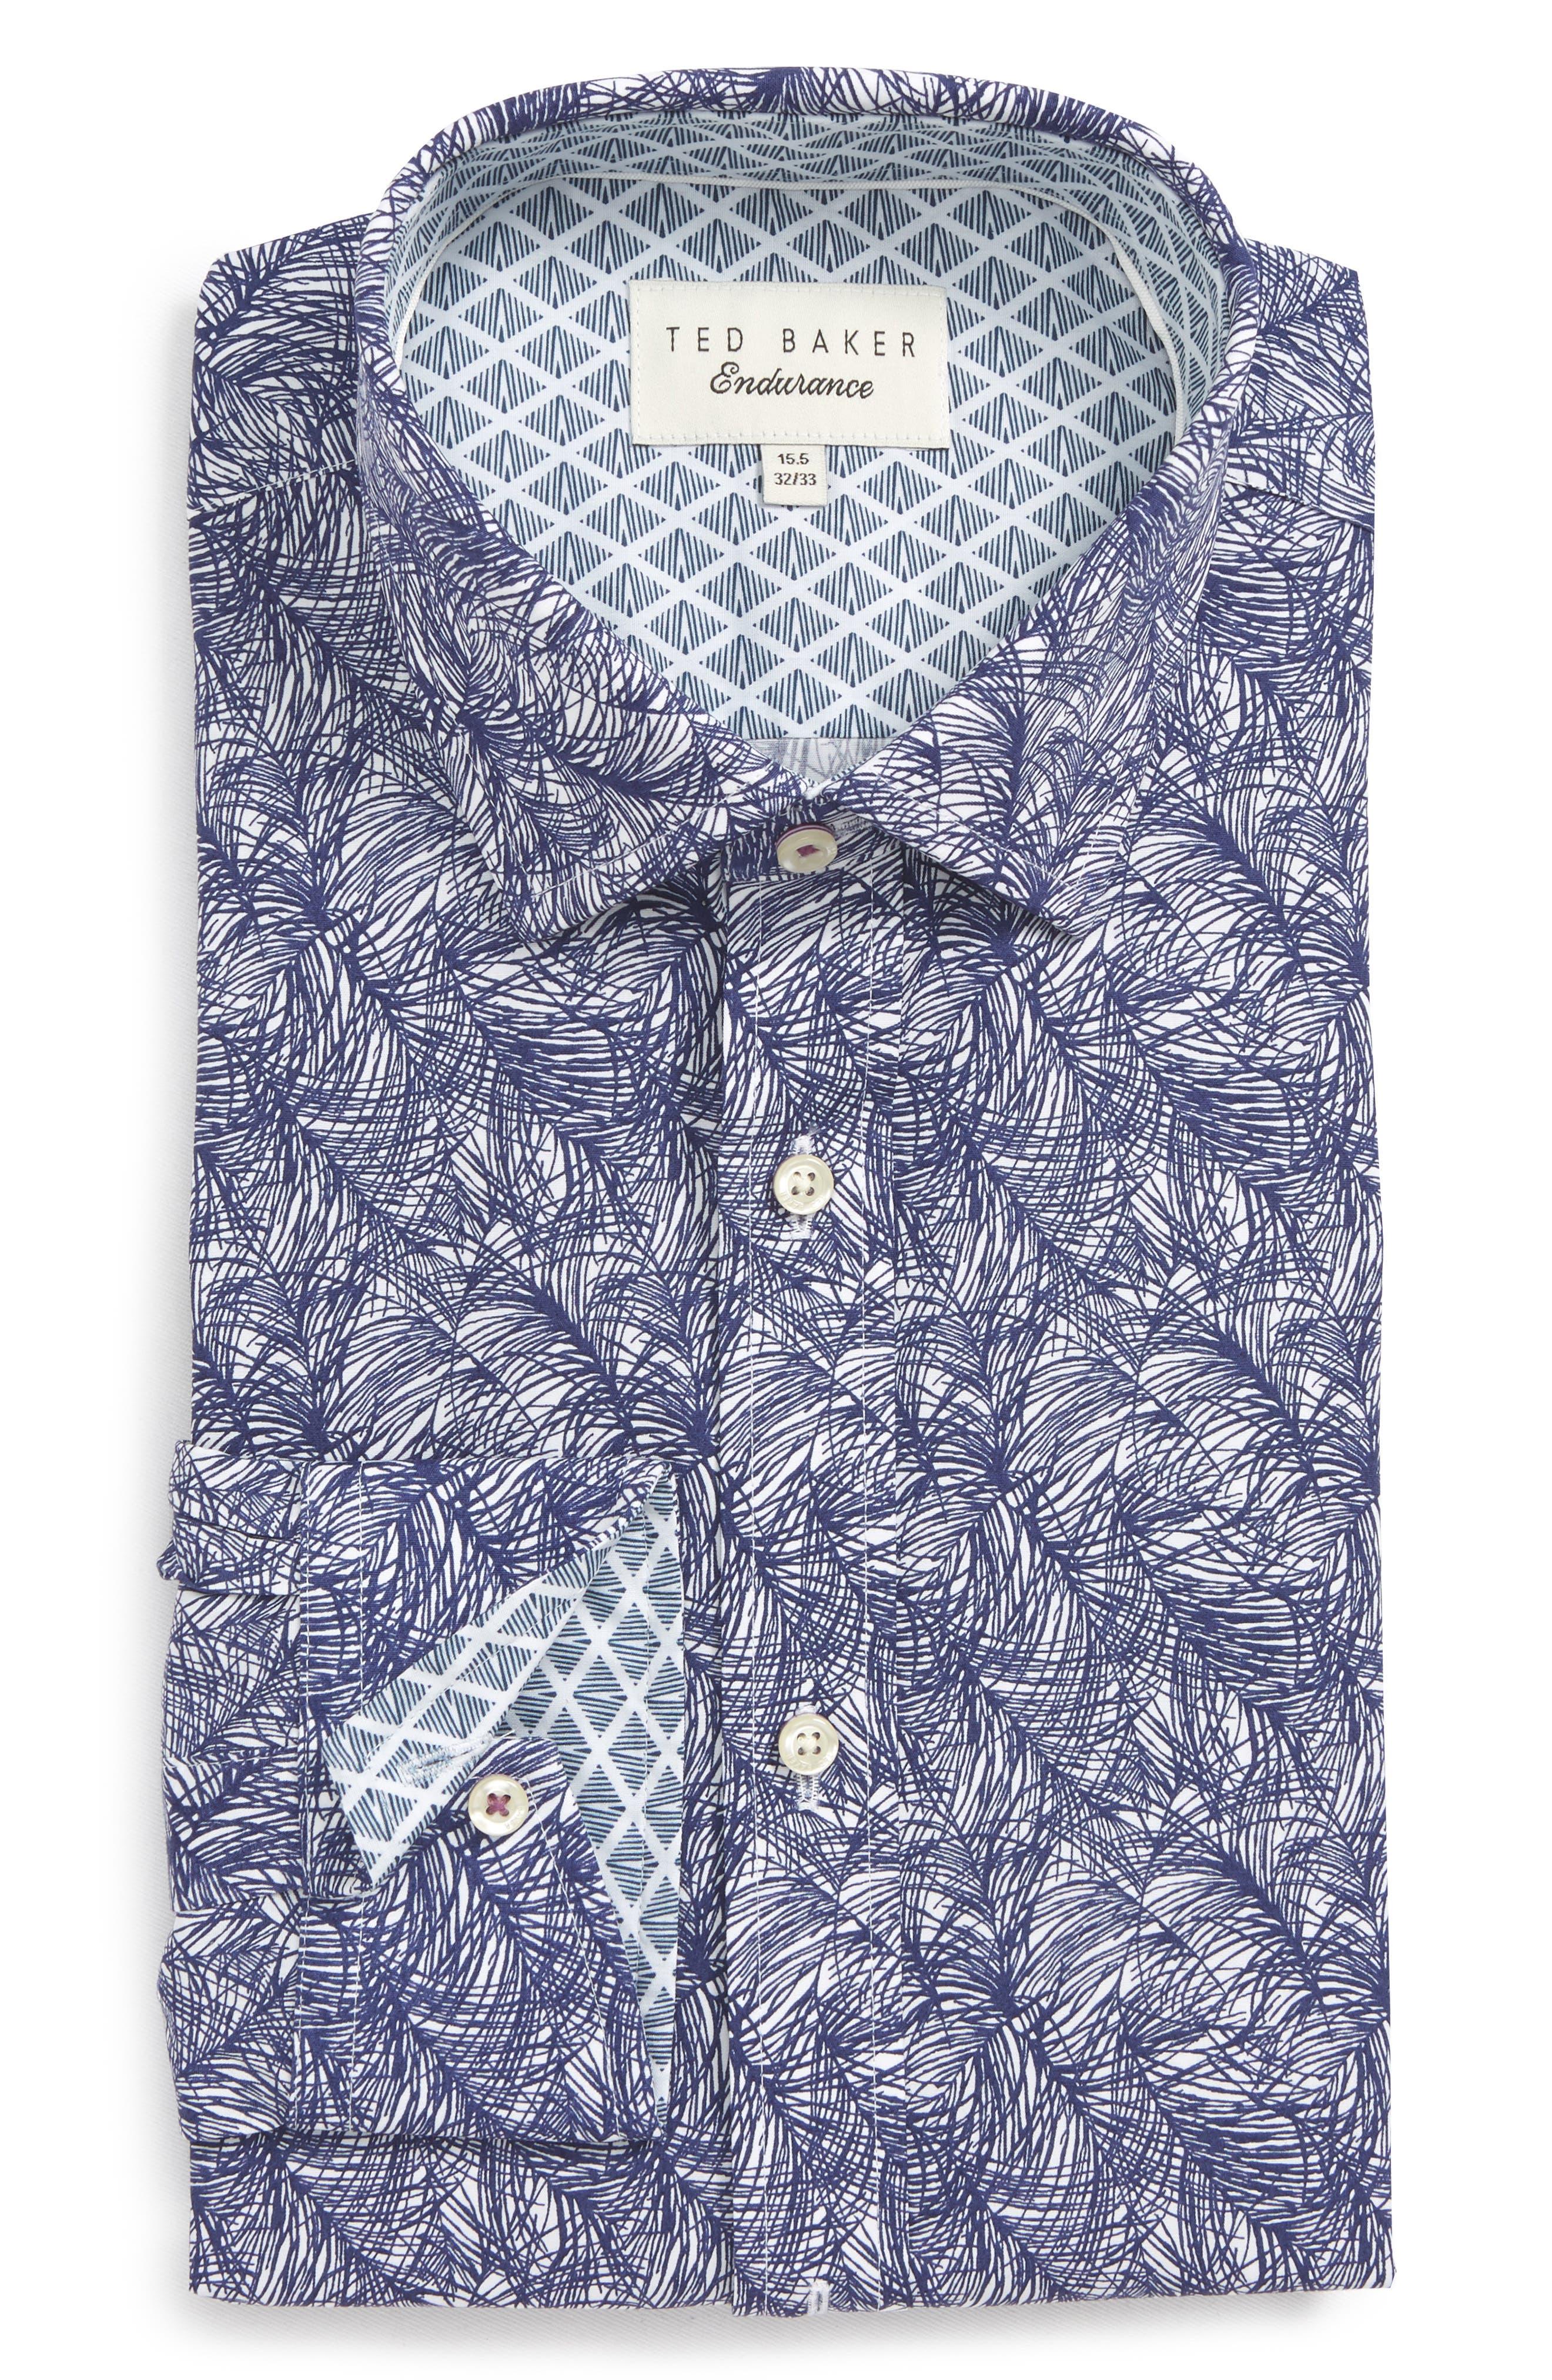 Messera Trim Fit Print Dress Shirt,                             Main thumbnail 1, color,                             Navy